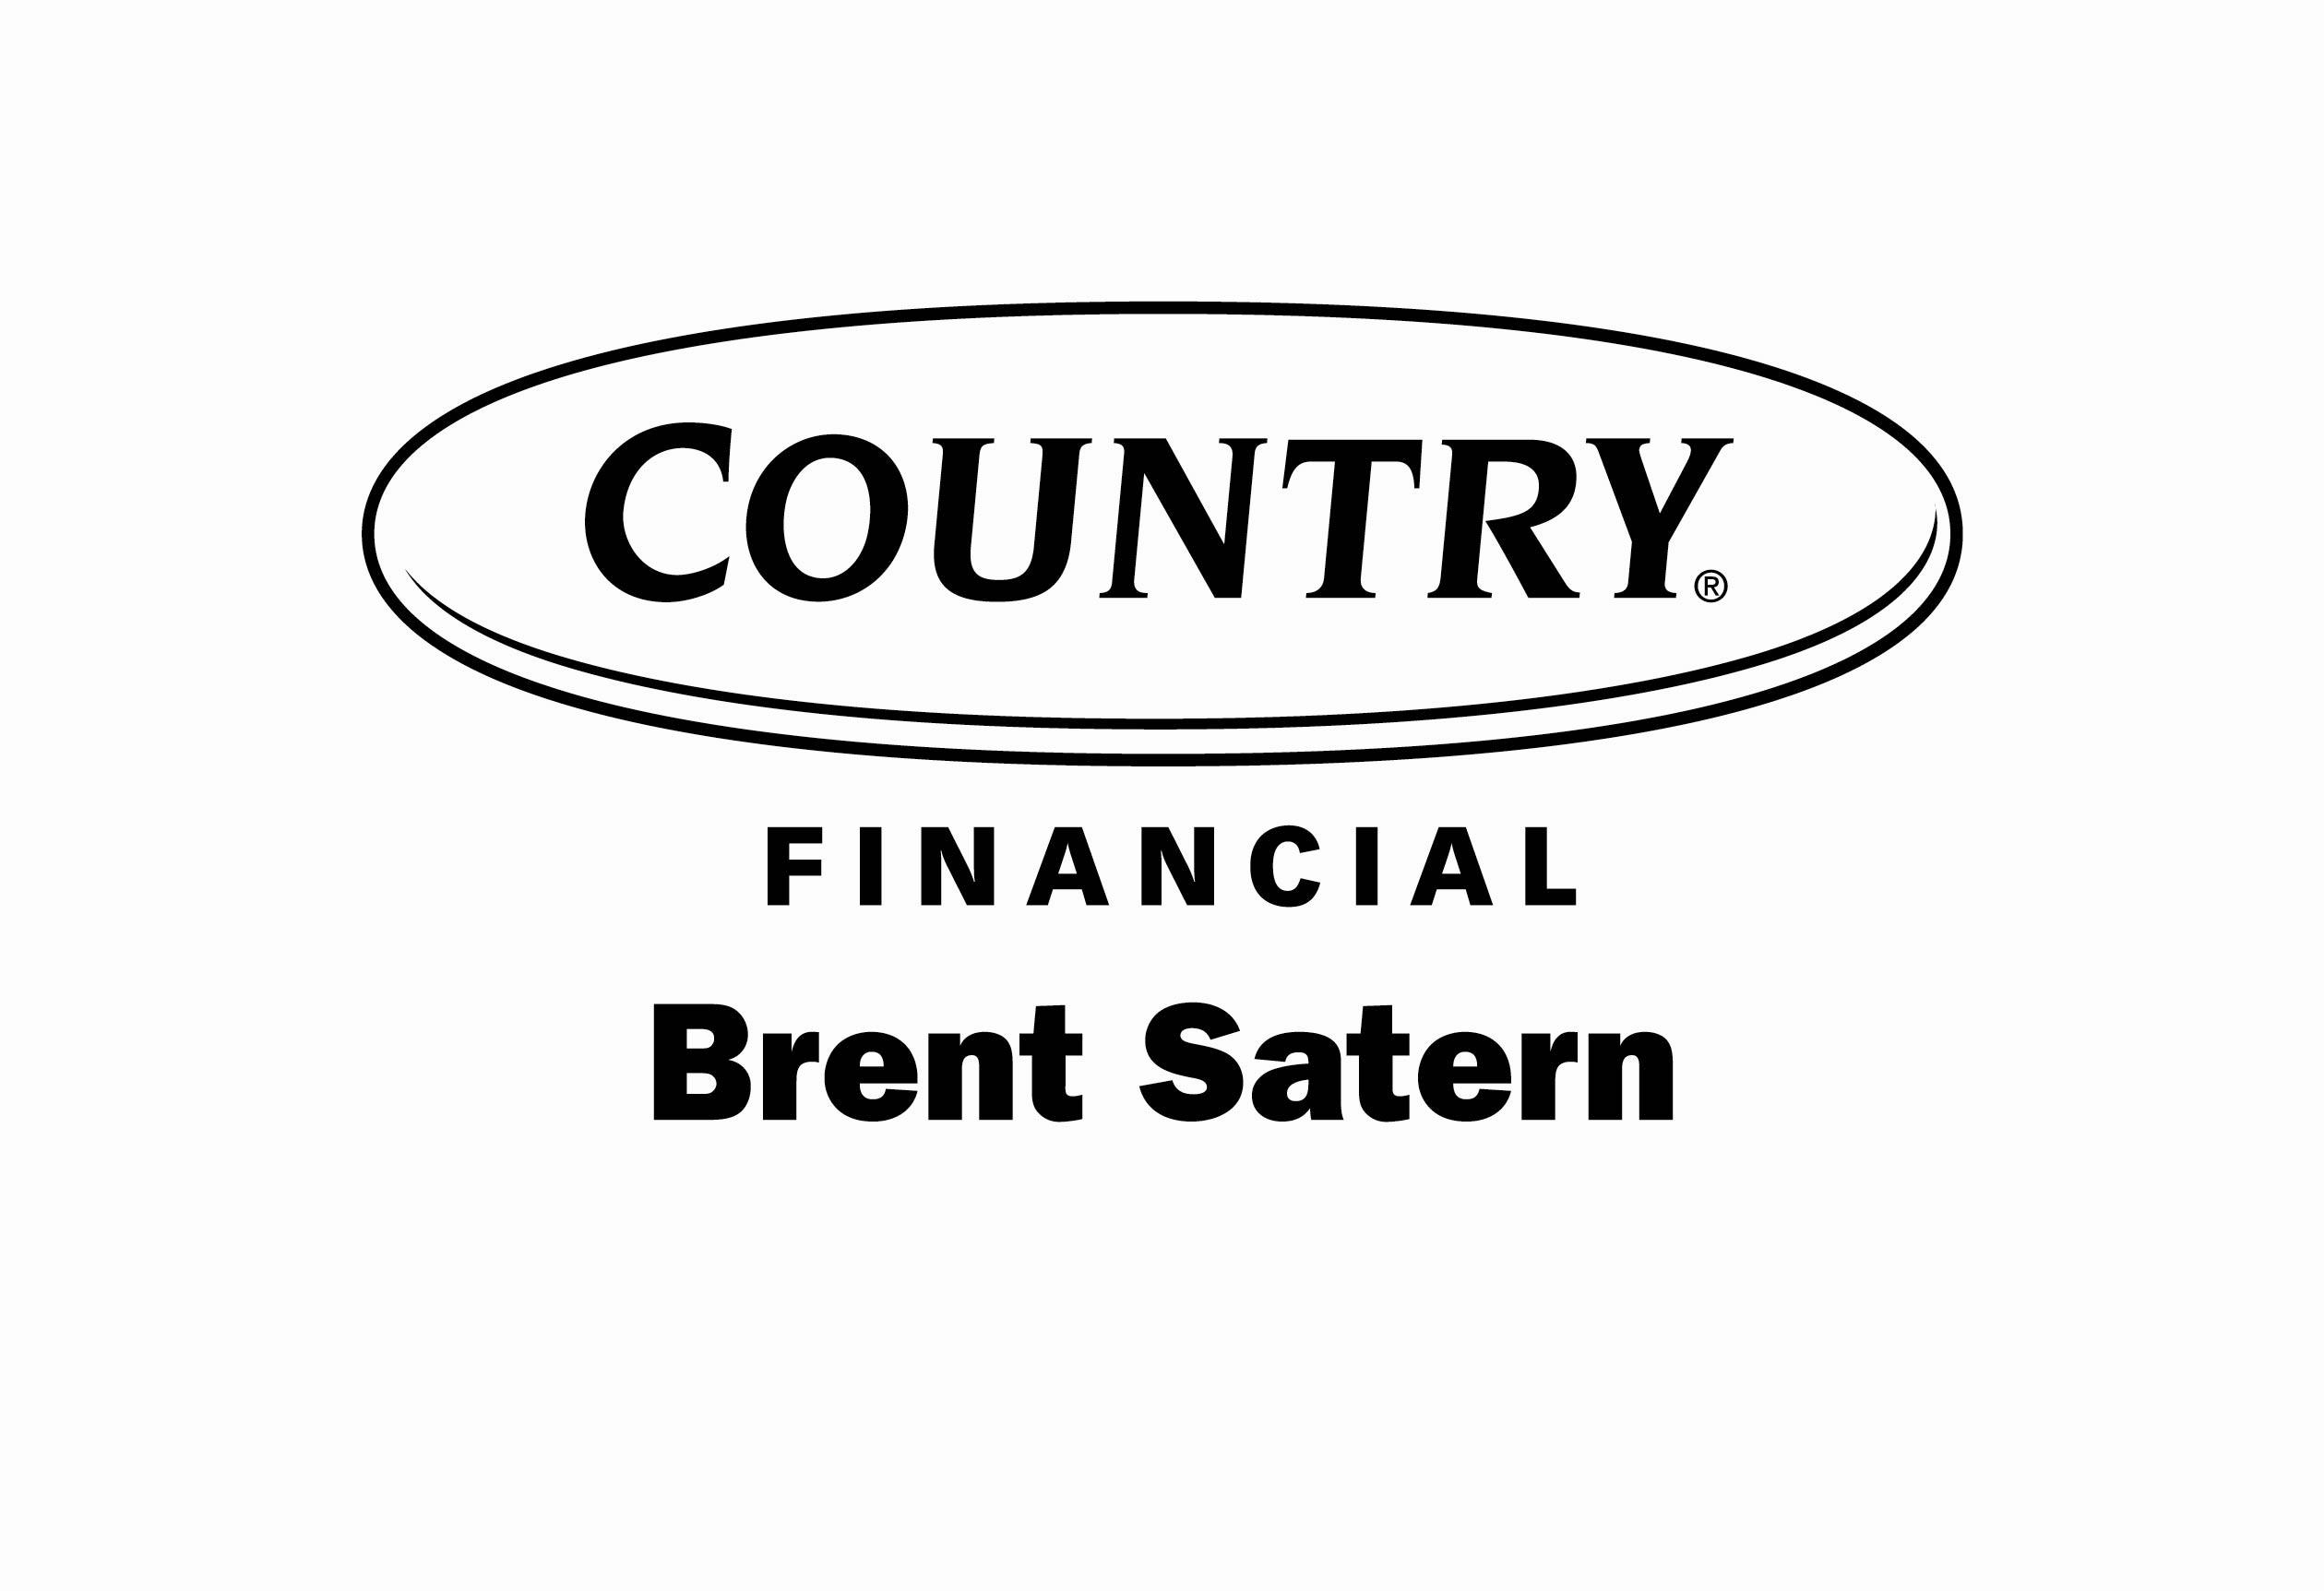 Brent Satern